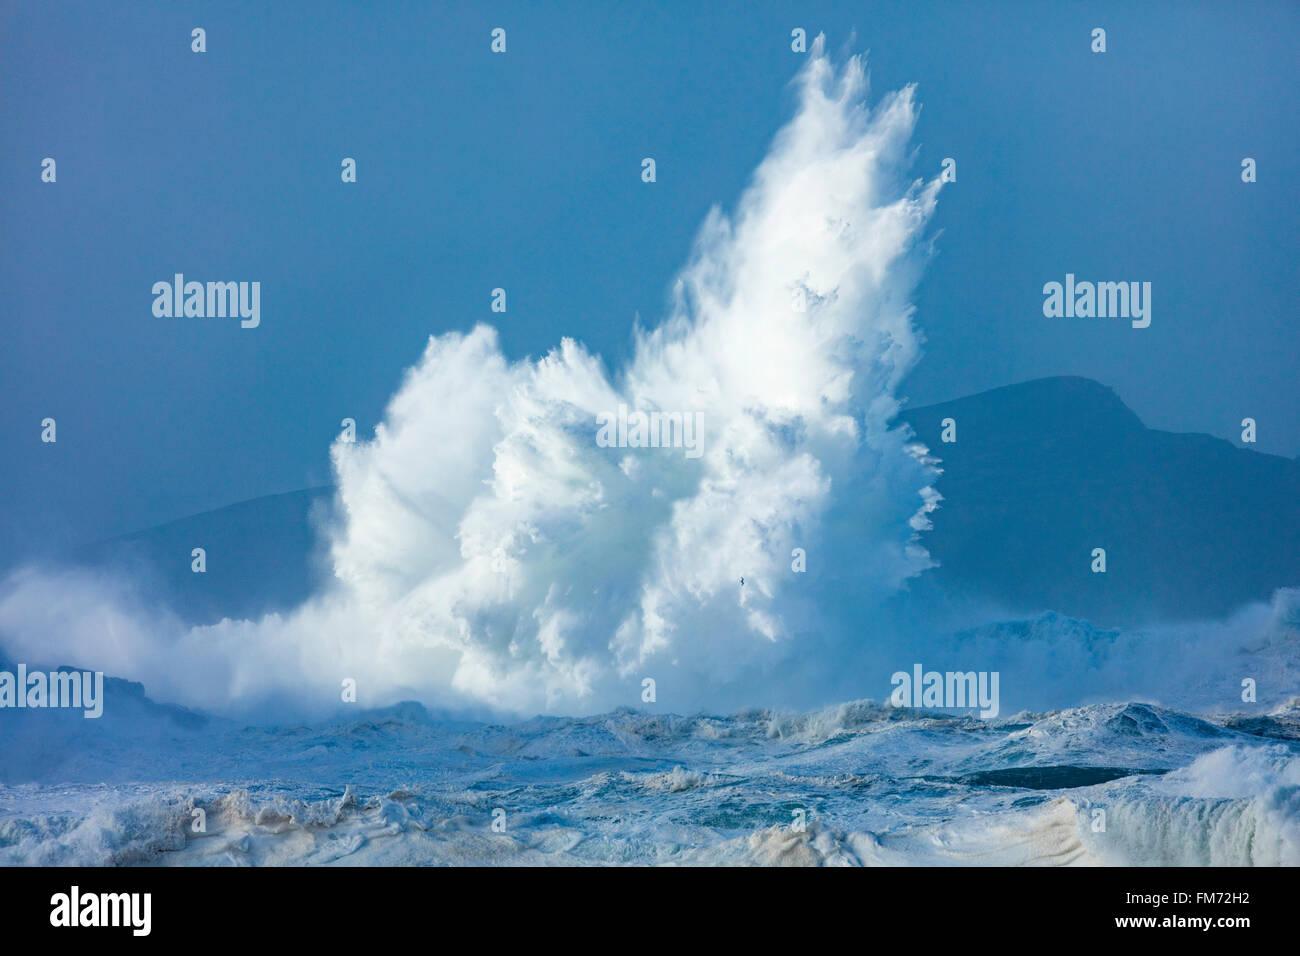 Storm waves breaking near Clogher Head, Dingle Peninsula, County Kerry, Ireland. - Stock Image